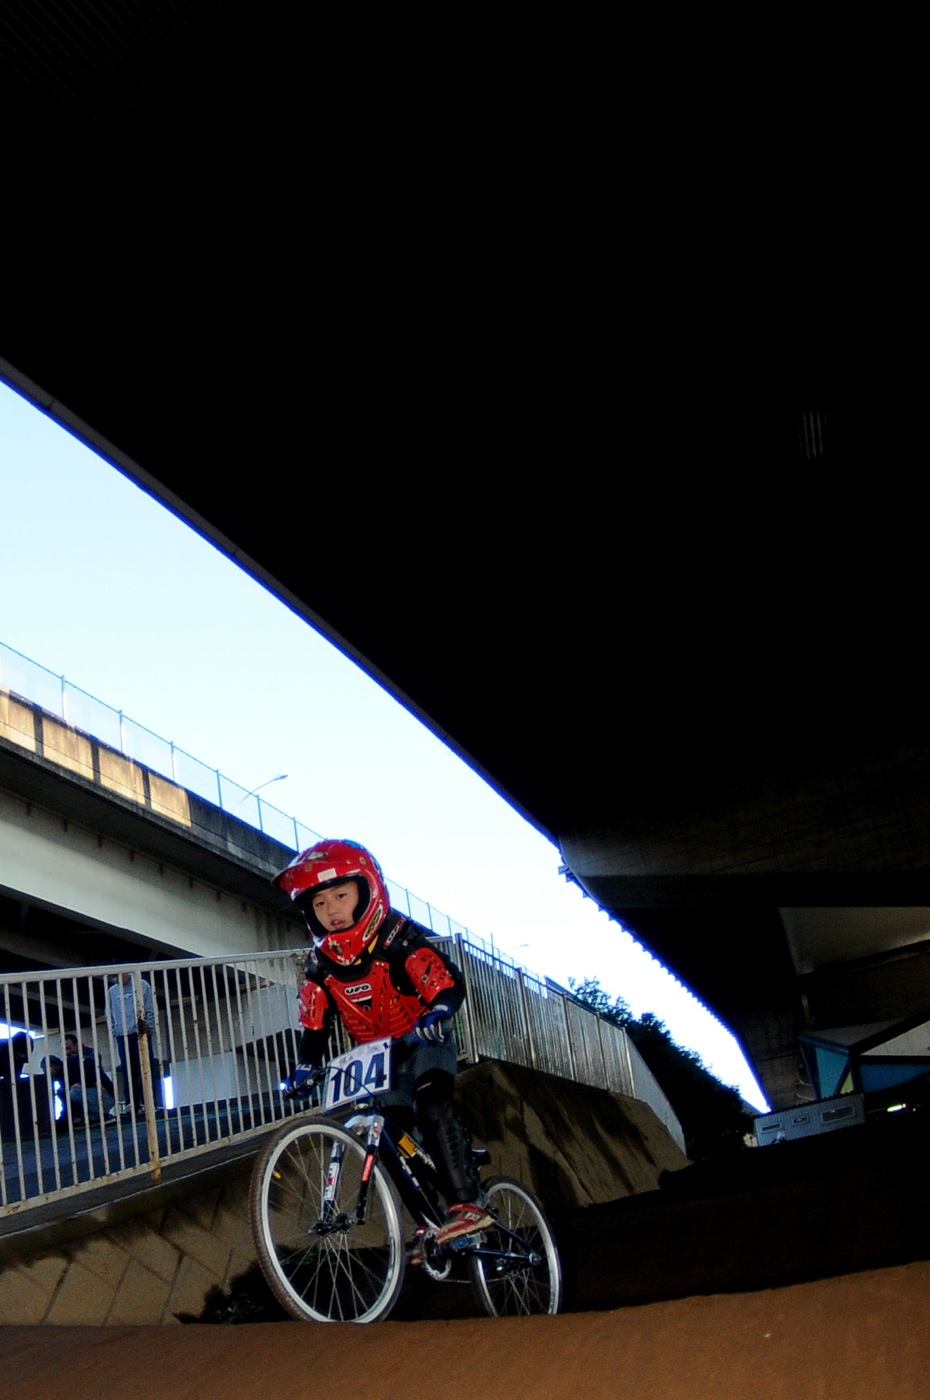 2009JOSF川口ゴリラ公園12月定期戦VOL9:コース外の風景..._b0065730_20481215.jpg